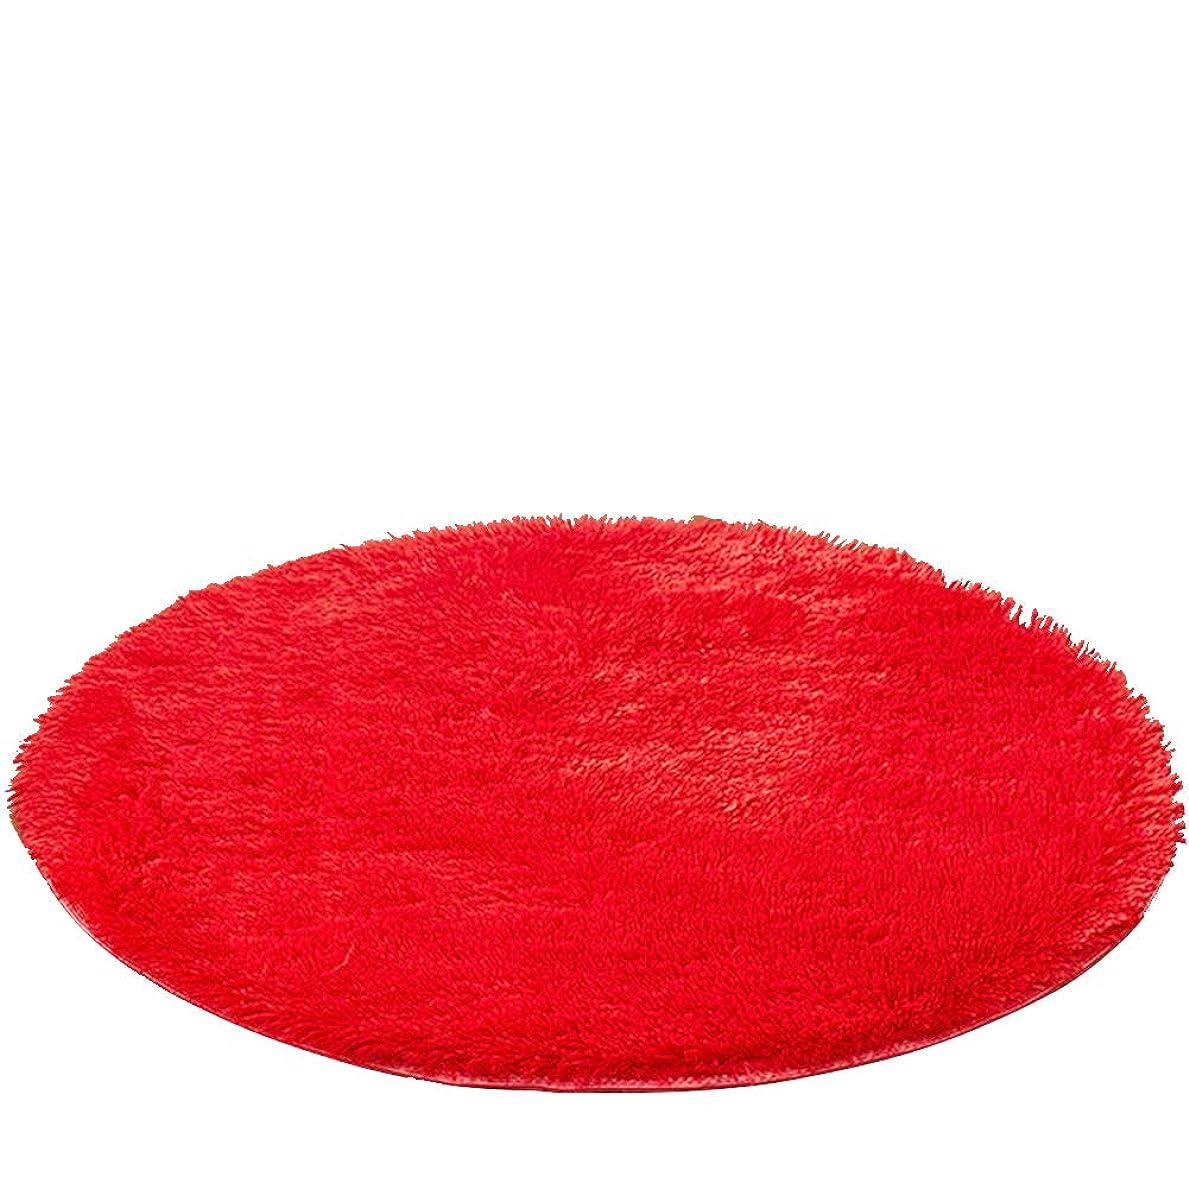 Kikon 洗える 円形 ラグマット カーペット オールシーズン シャギーラグ 絨毯 滑り止め付 丸型 冬用 夏用 防ダニ 抗菌 防臭 床暖房対応 (直径100cm, レッド)